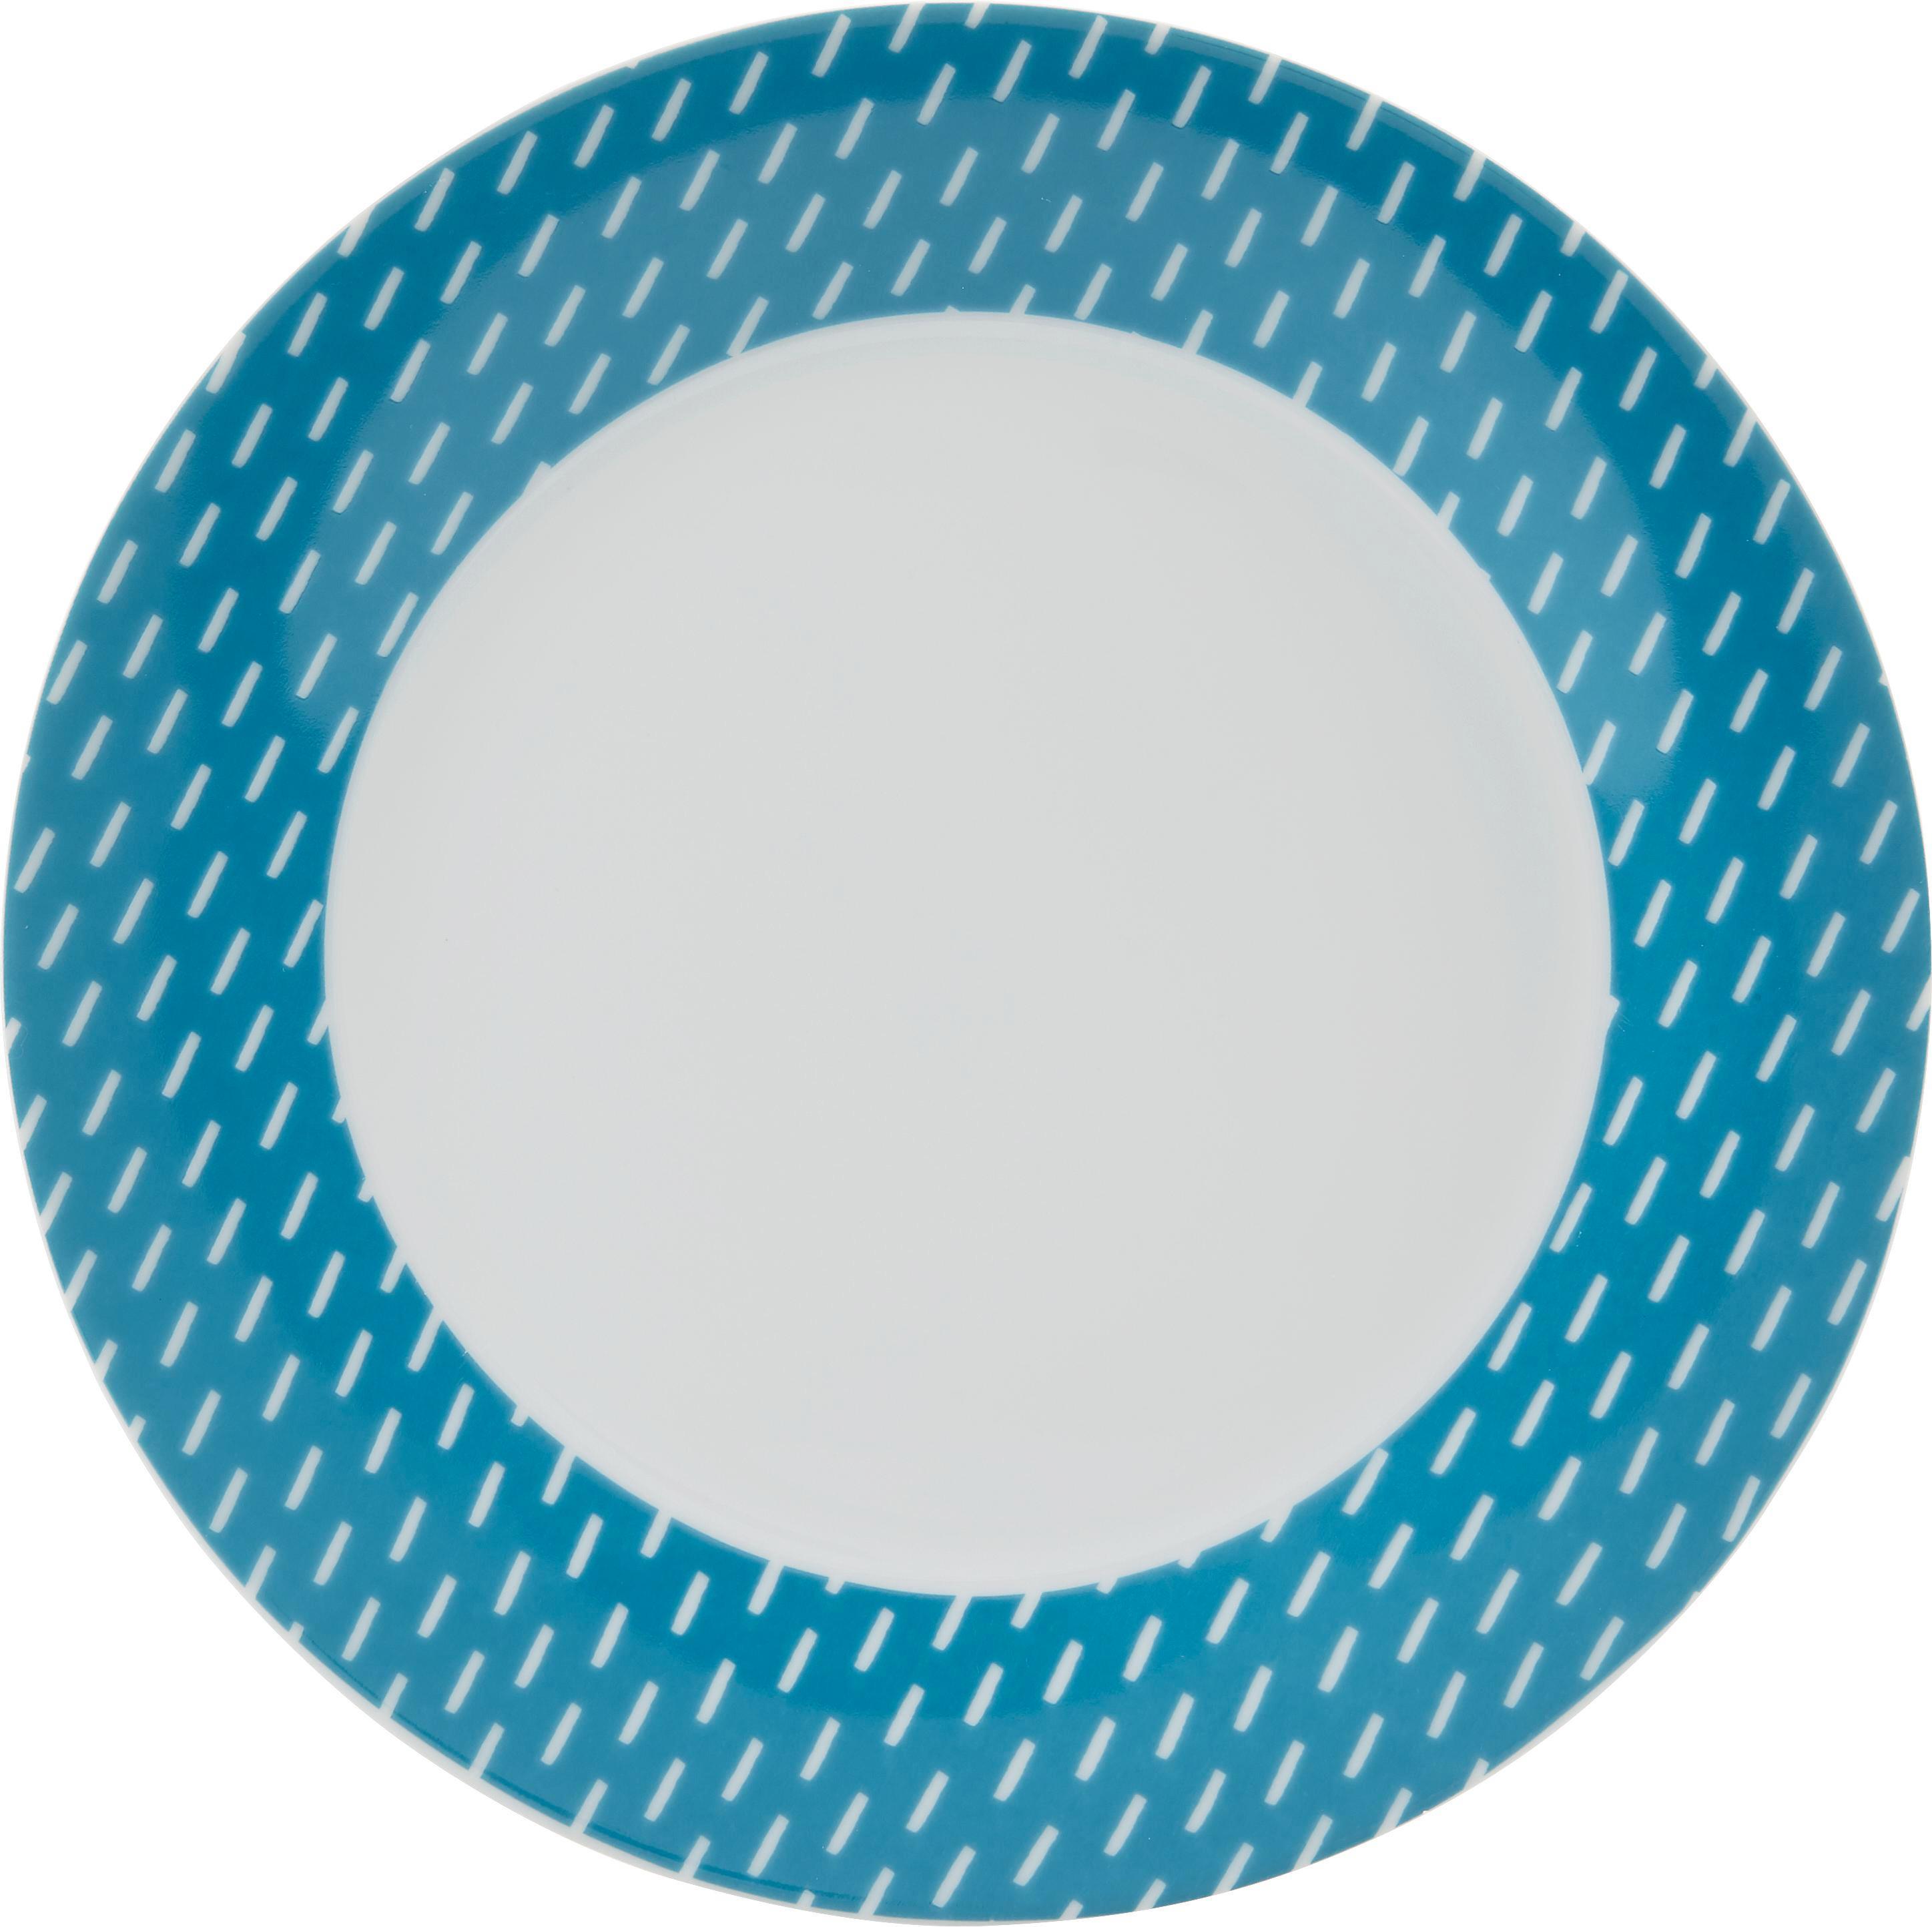 Desertni Krožnik Shelly - turkizna/bela, keramika (20,32cm) - MÖMAX modern living